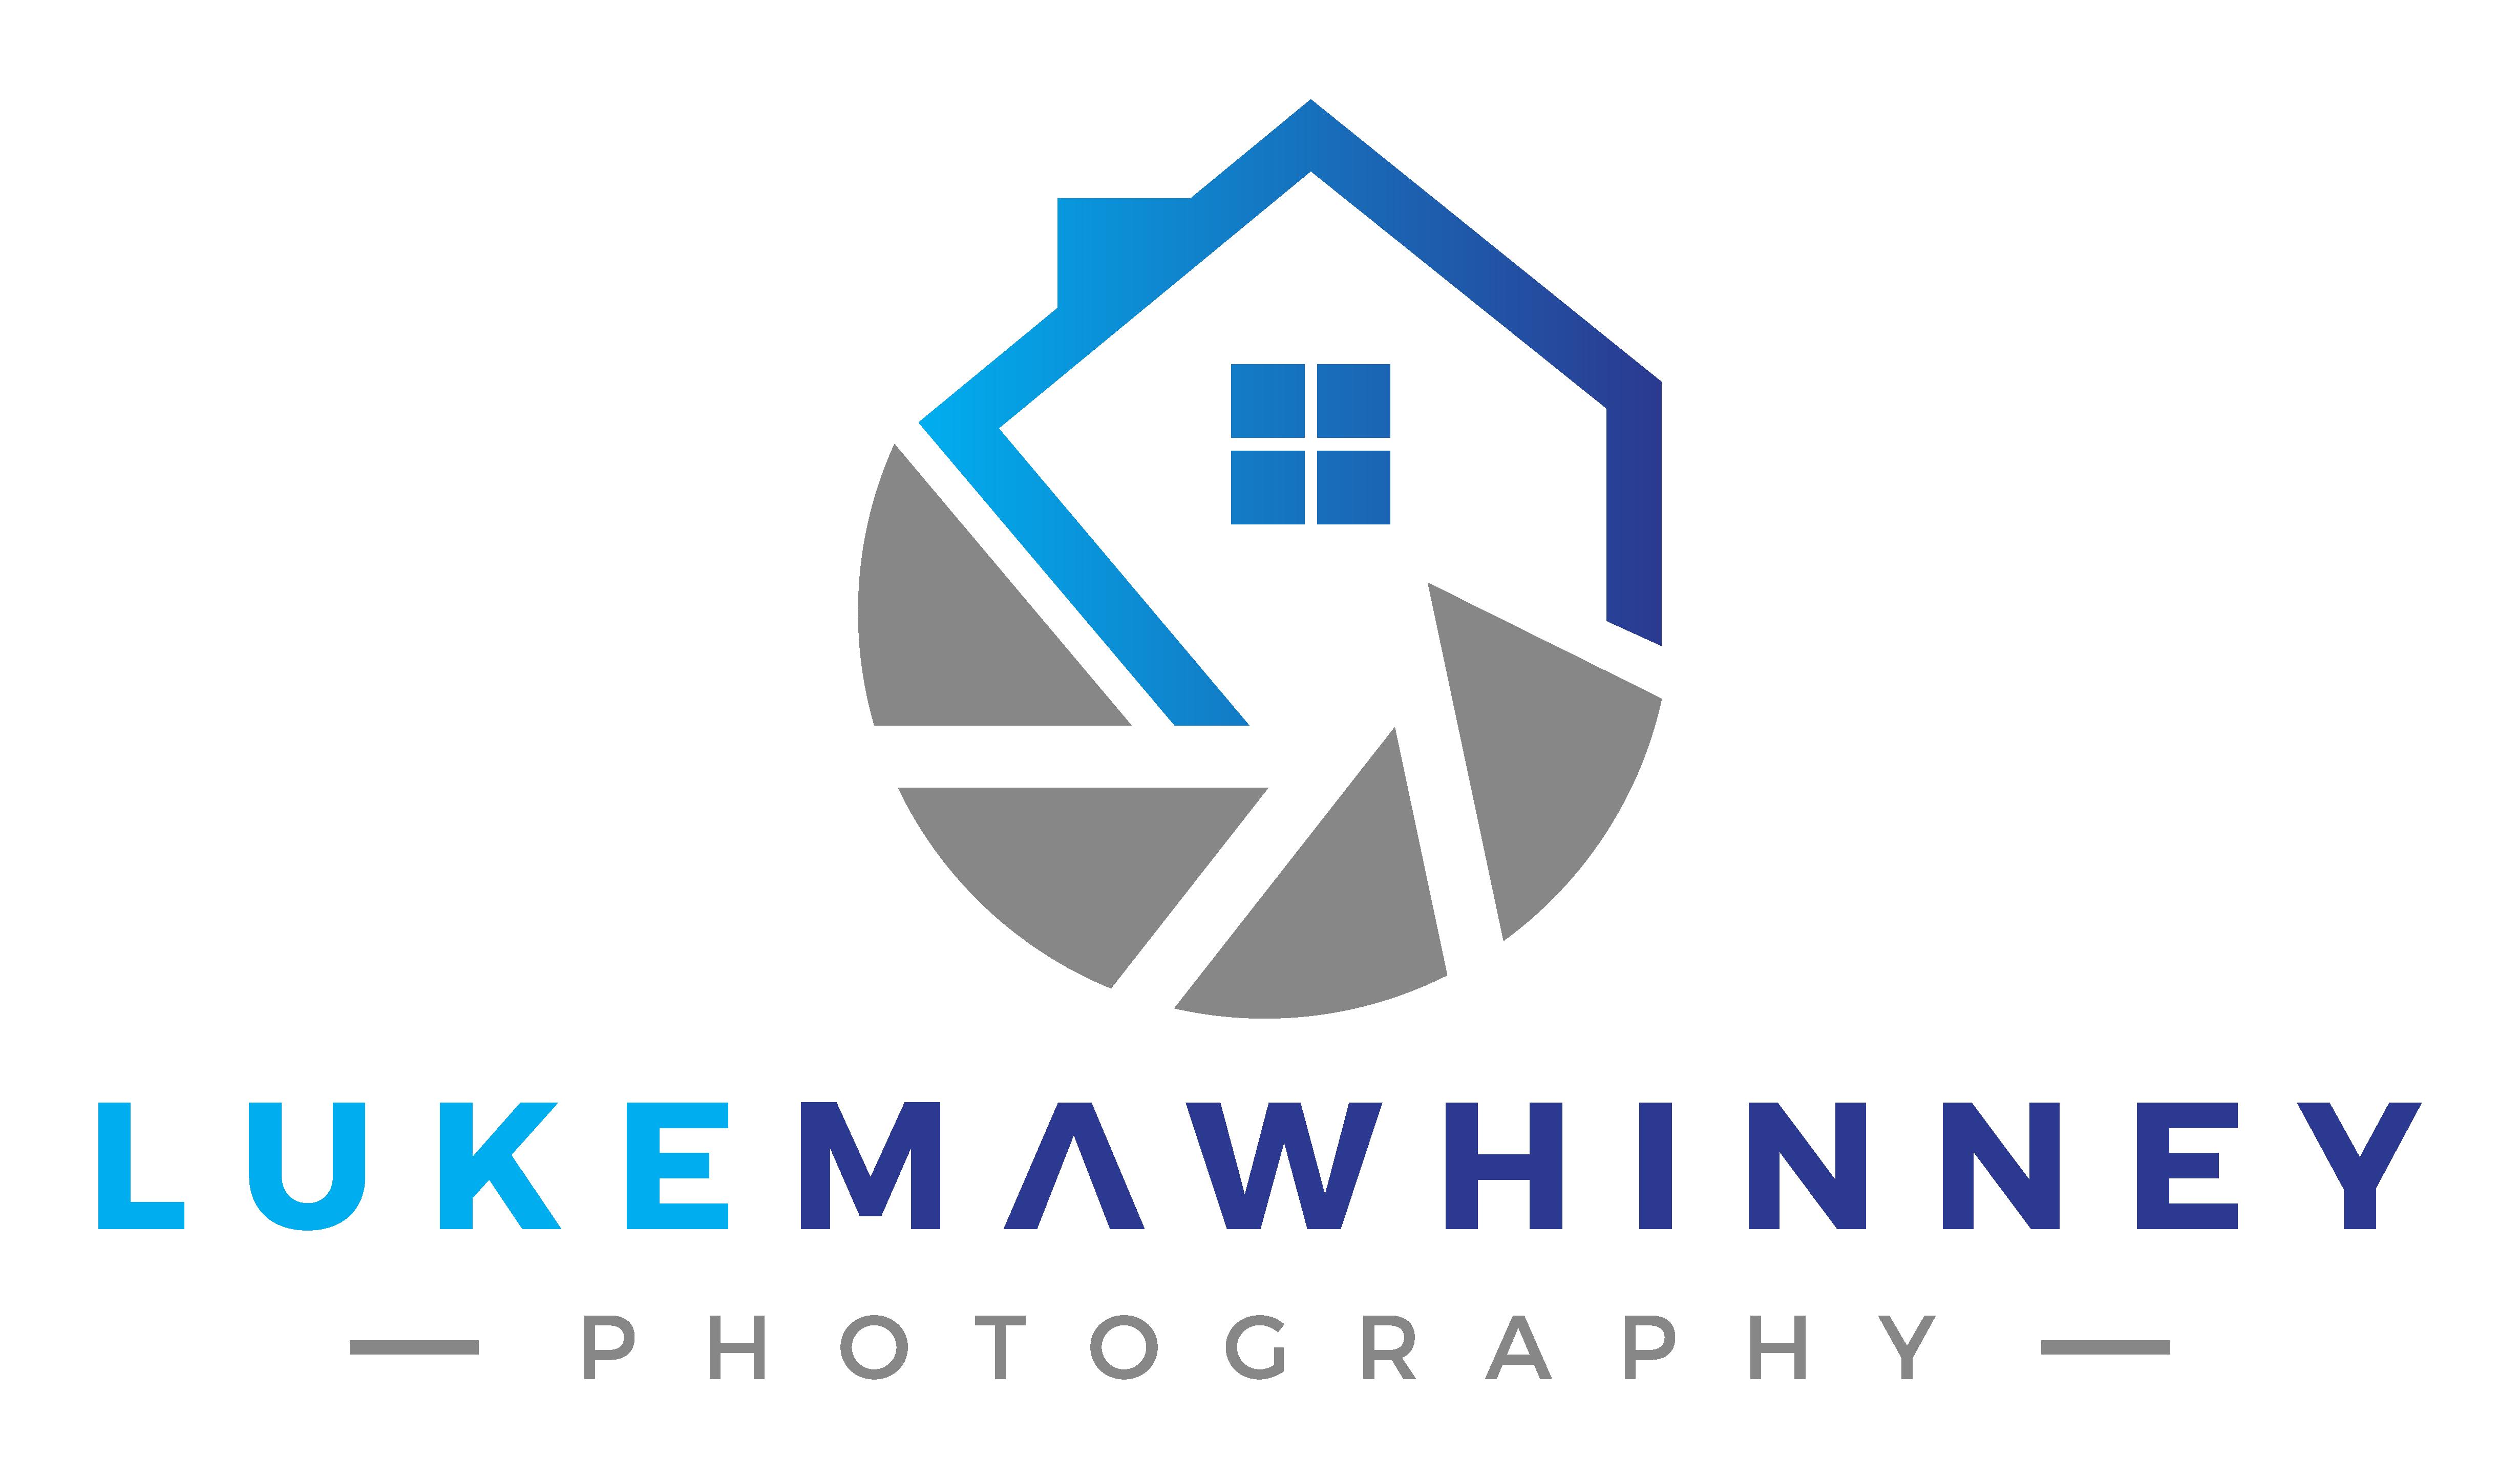 Luke Mawhinney Photography logo